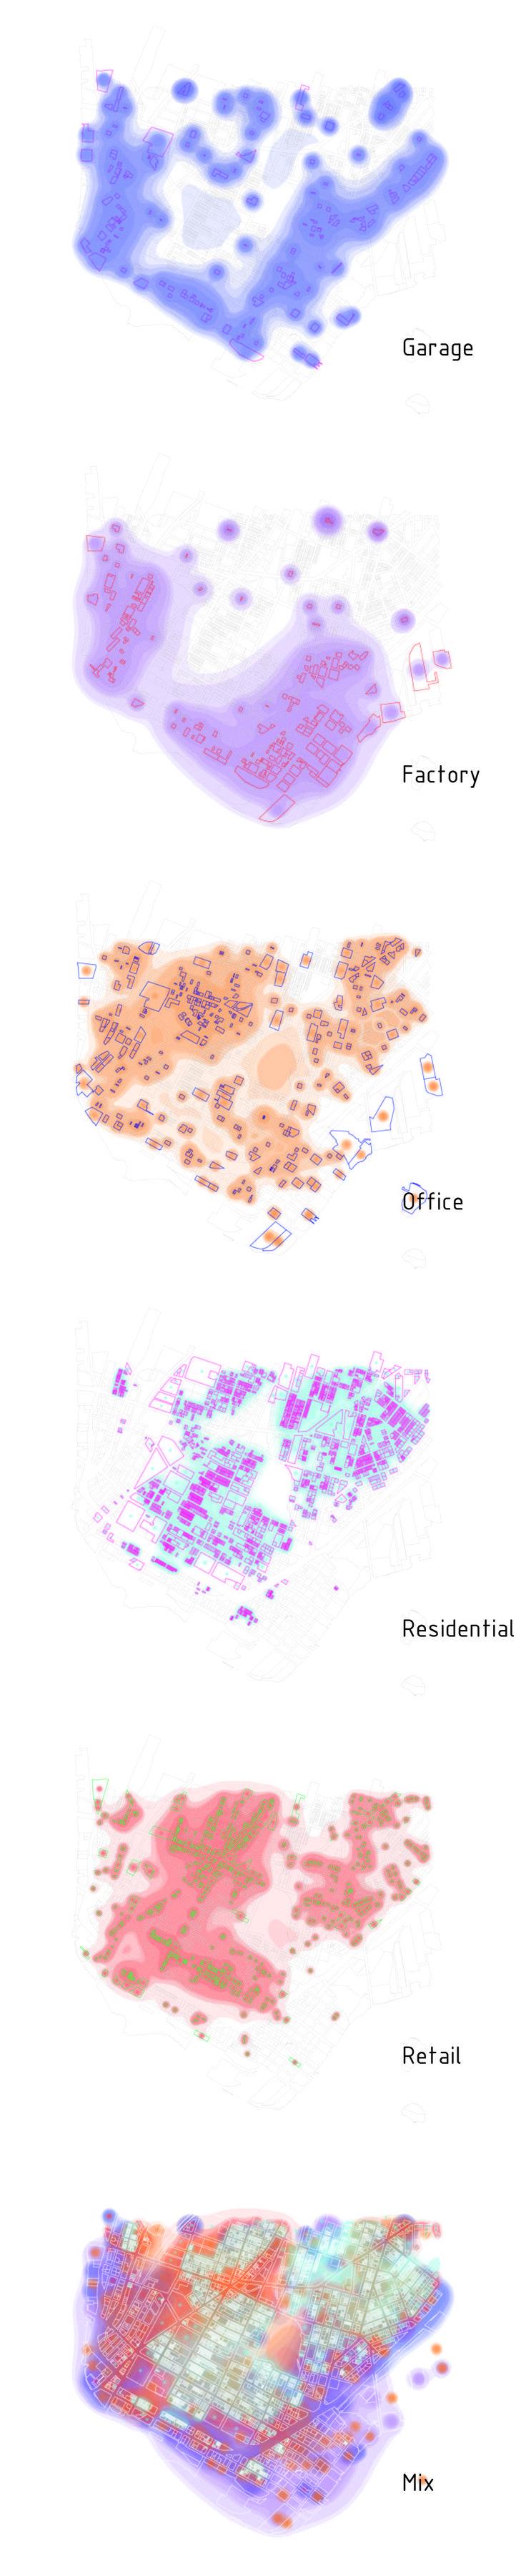 Land Use Analysis of South Bronx / 2016 / Huai Kuan Chung